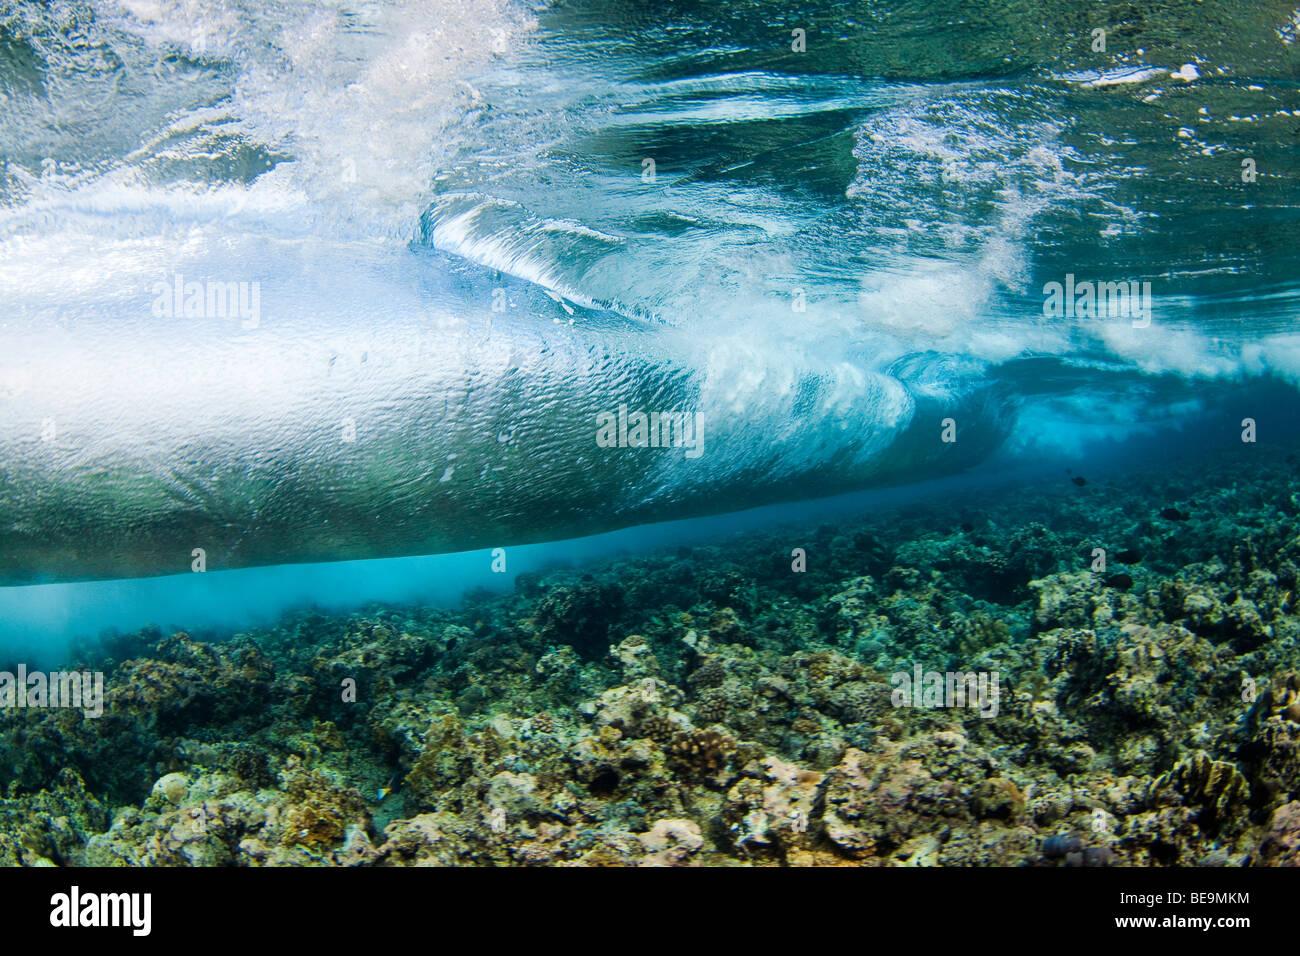 Surf stürzt auf dem Riff in Nationalpark Tubbataha, Philippinen. Stockbild